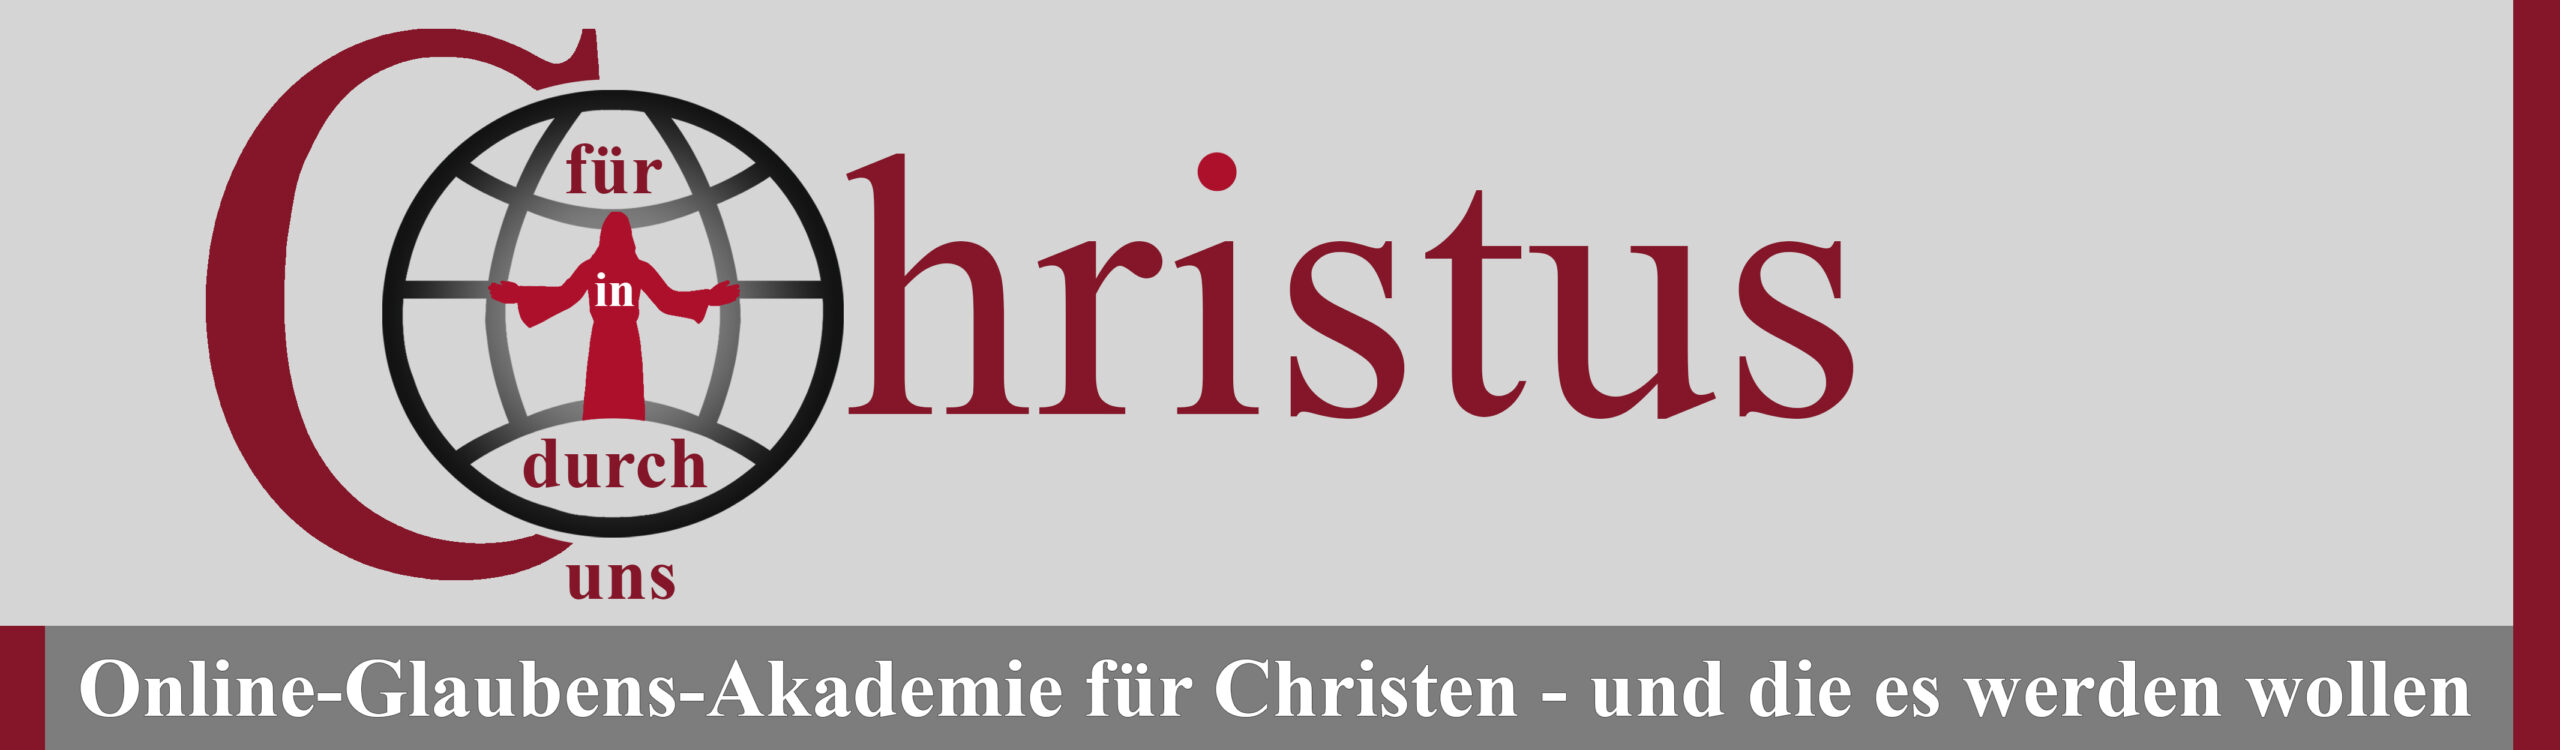 Online-Glaubens-Akademie